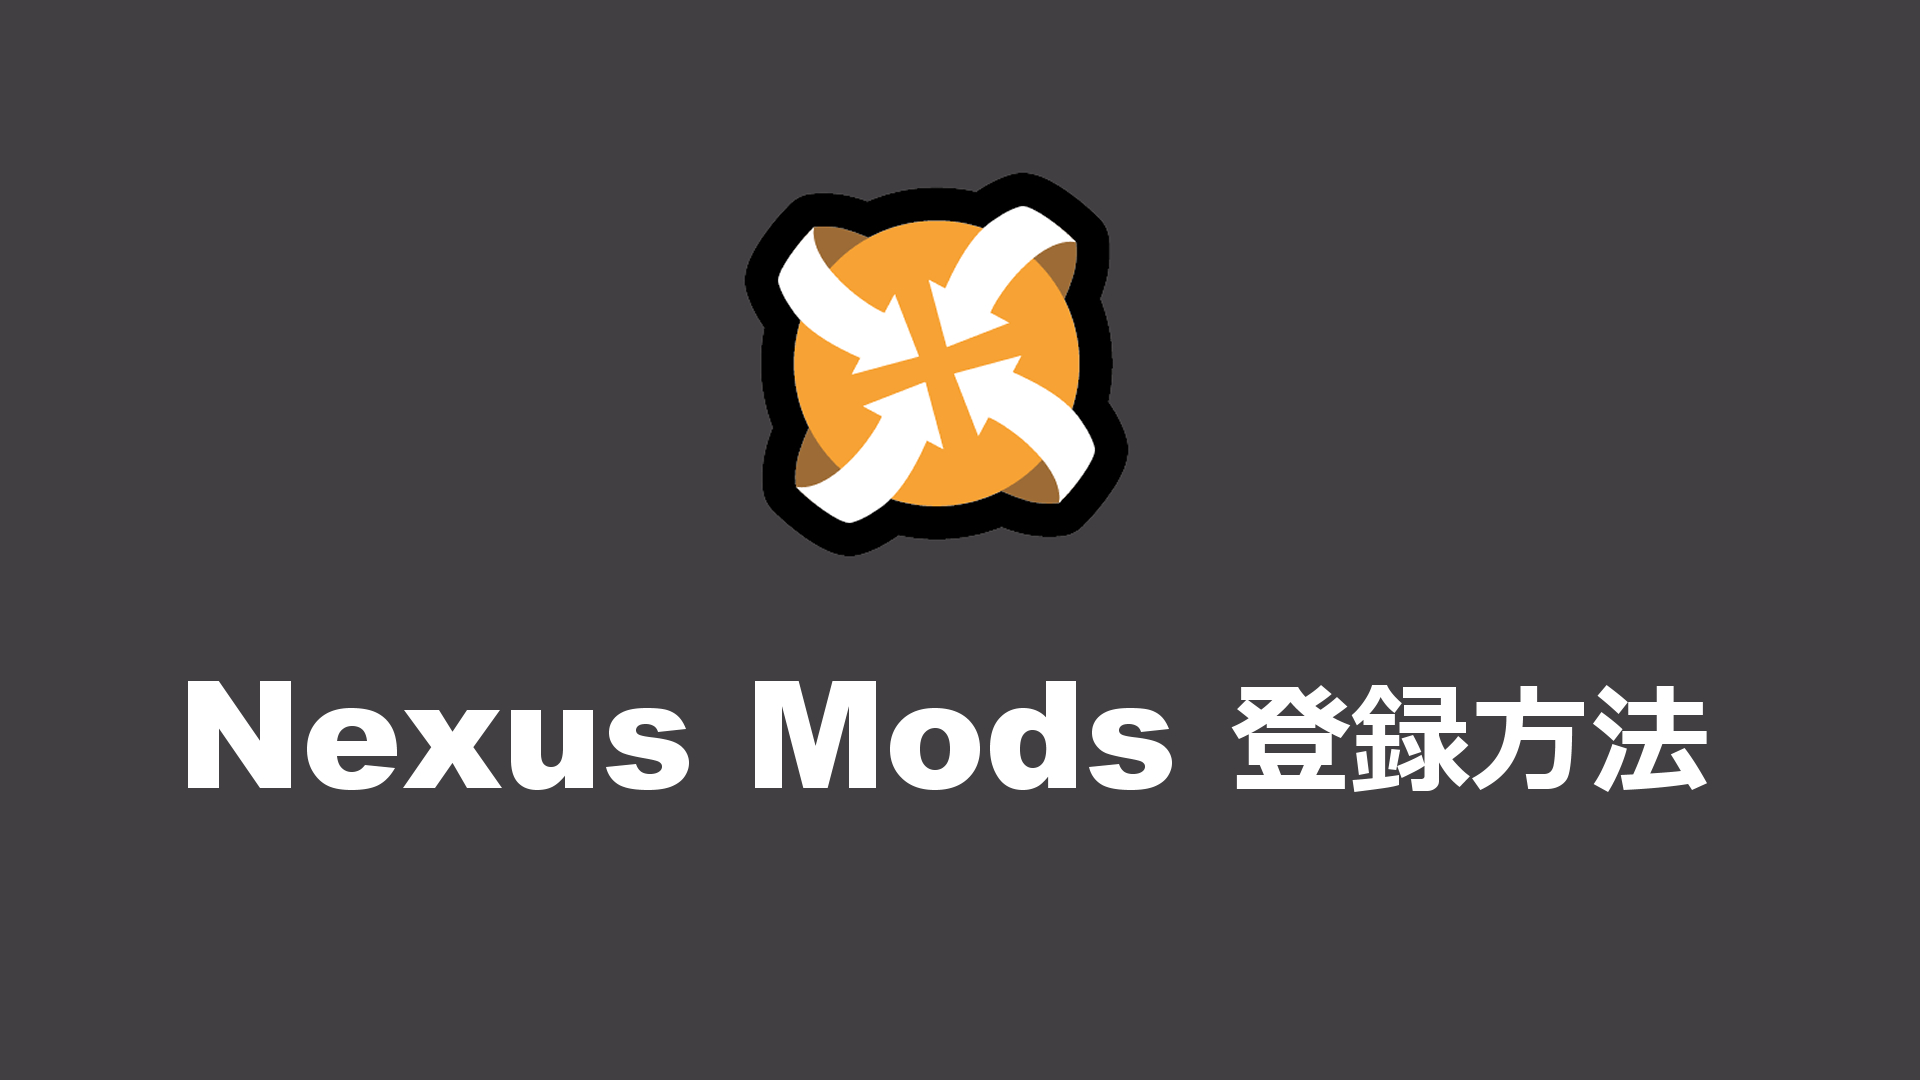 【Nexus mods】登録方法と年齢制限解除をわかりやすく解説